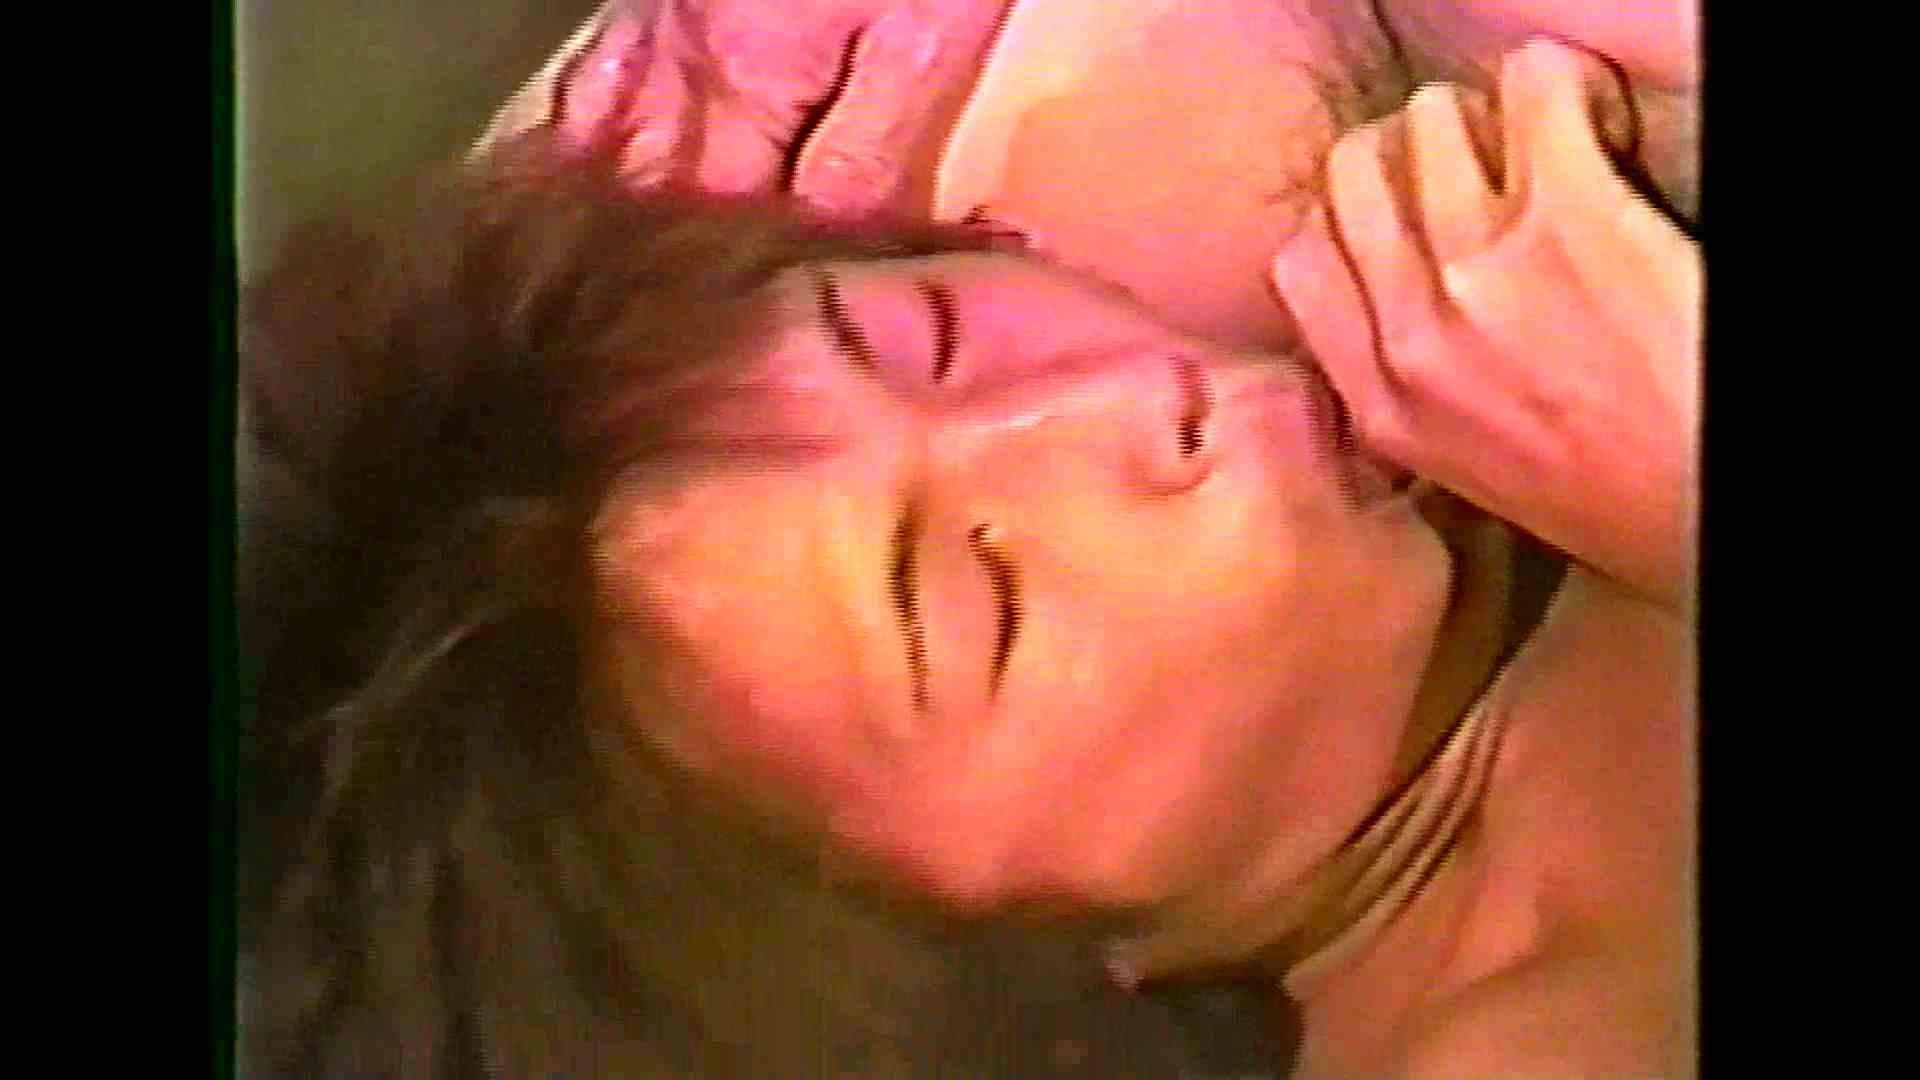 GAYBOY宏のオカズ倉庫Vol.3-2 ノンケ君達の・・ 男同士動画 101枚 18